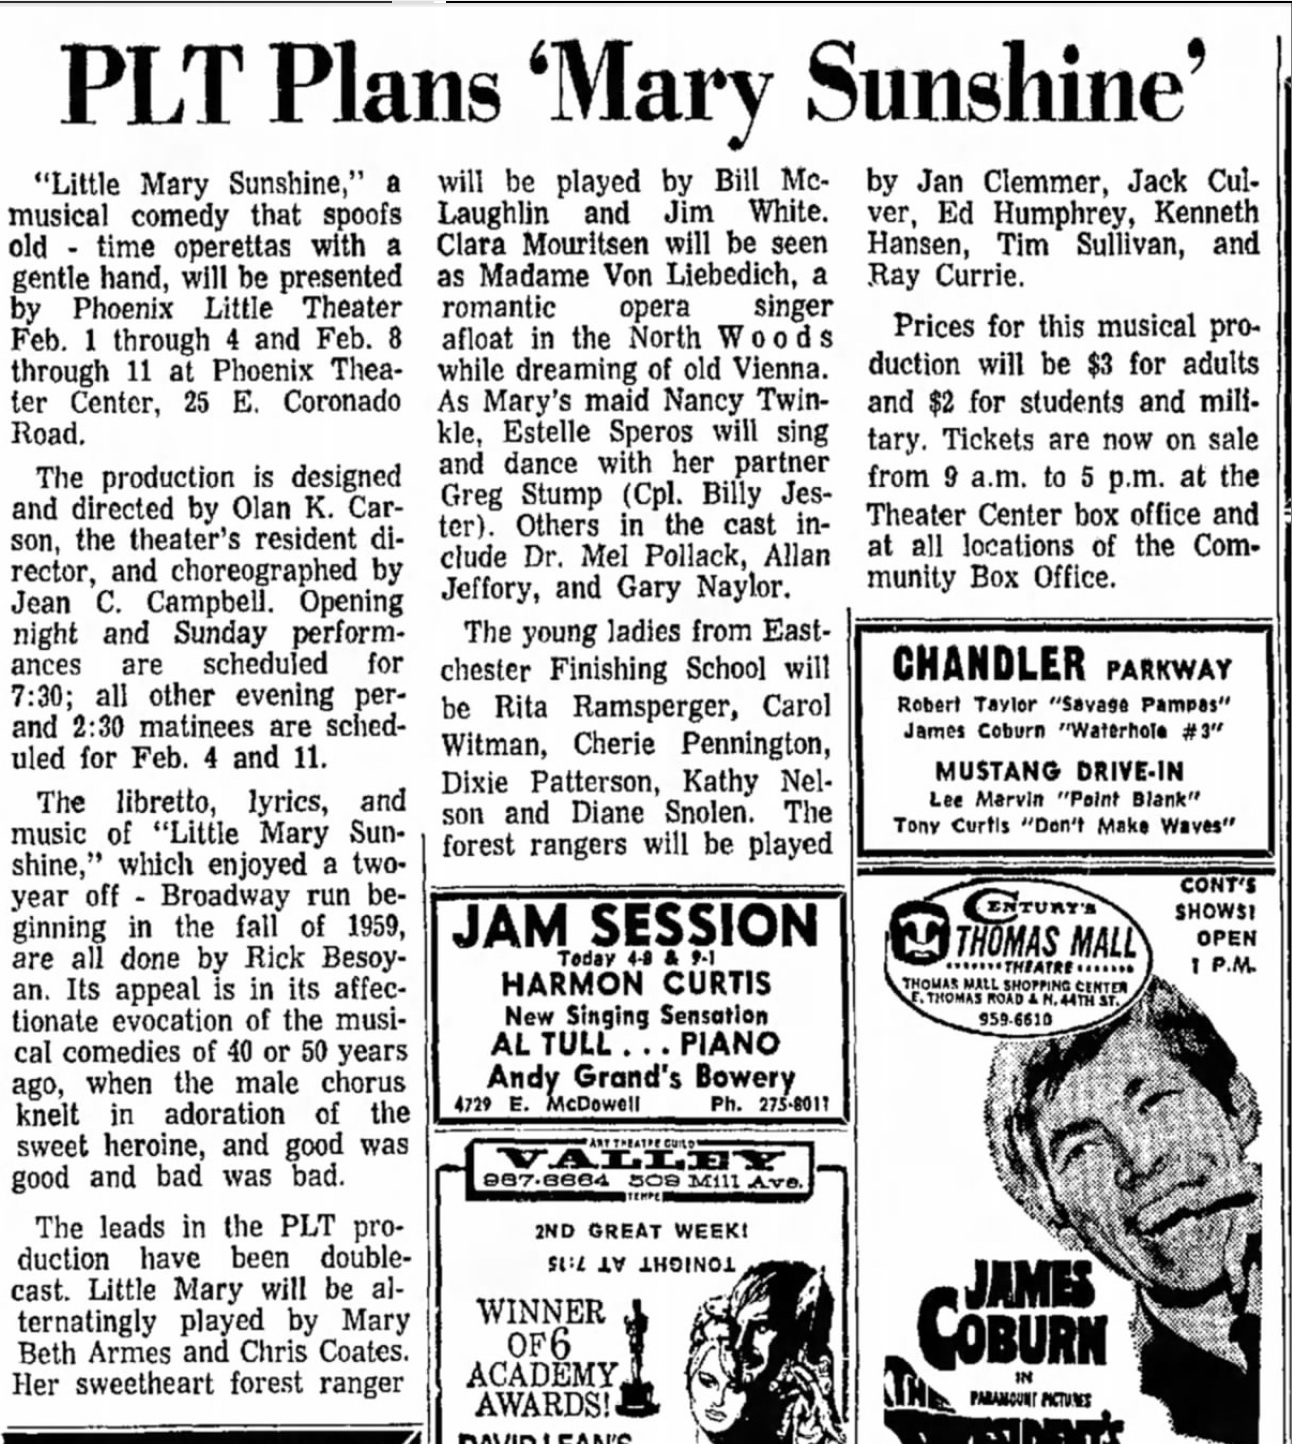 Arizona Republic, Jan. 28, 1968